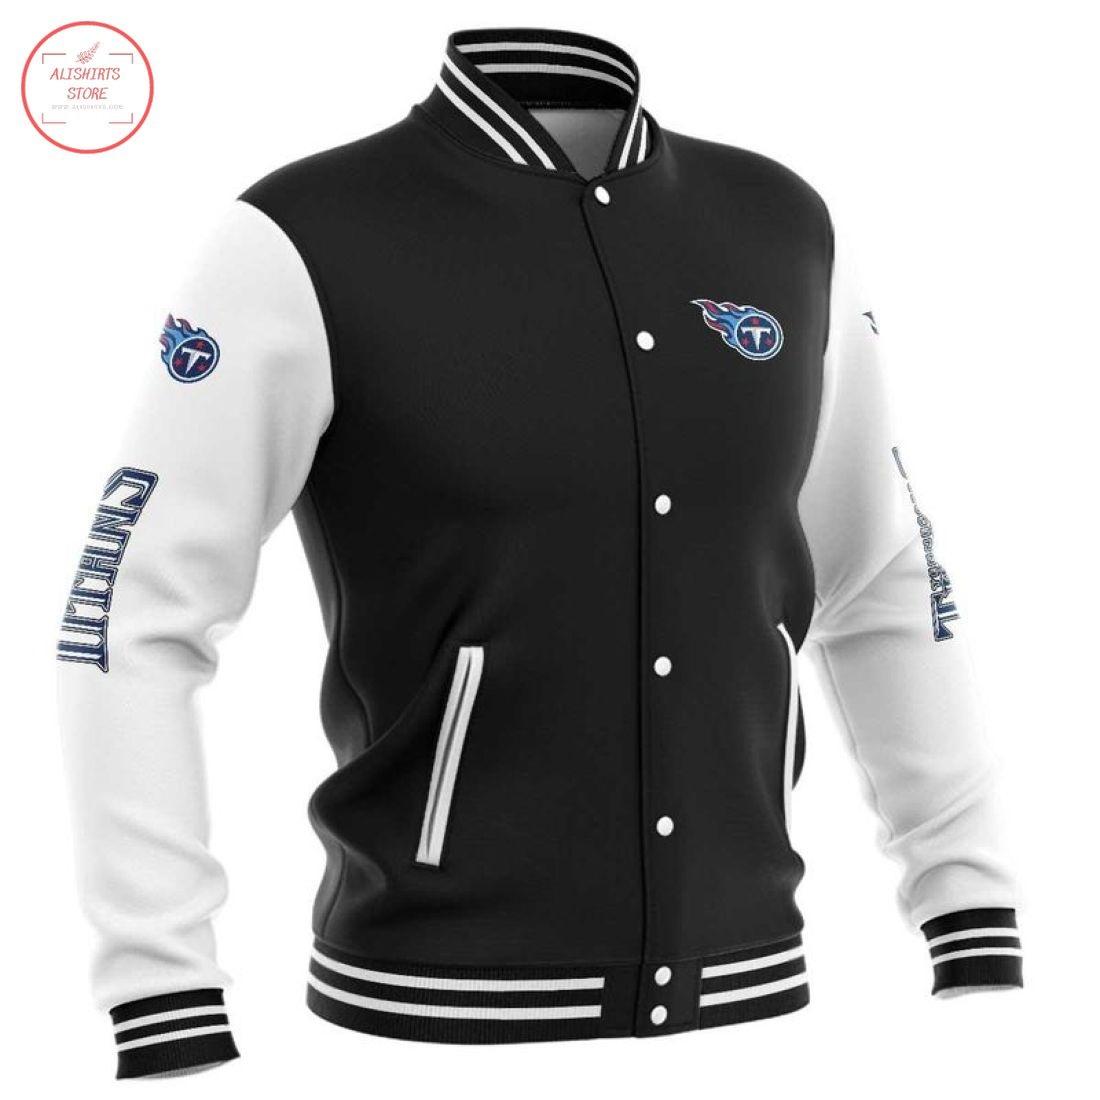 NFL Tennessee Titans Baseball Jacket